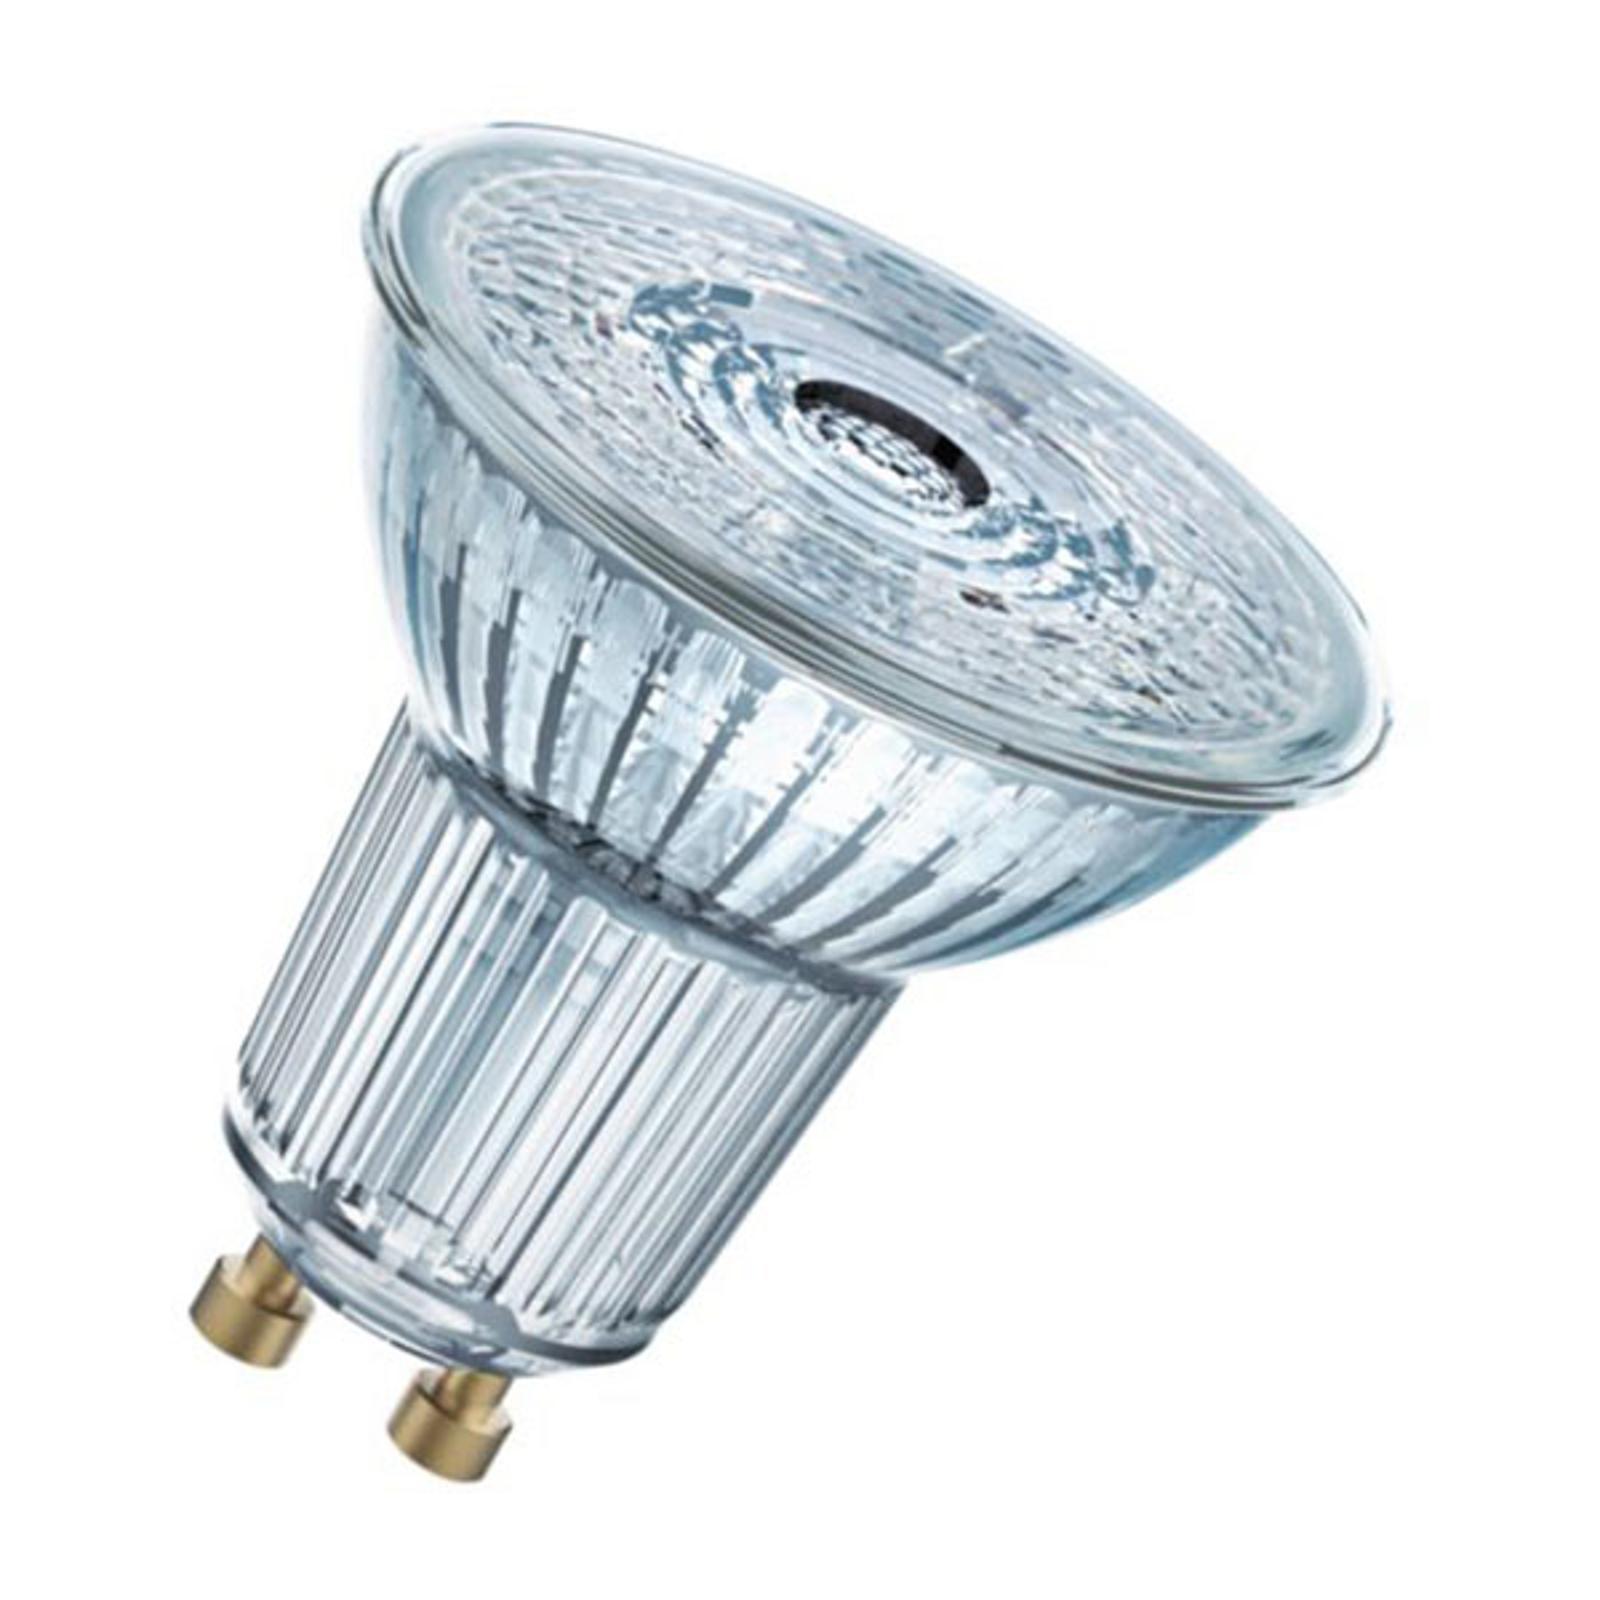 OSRAM-LED-heljastin GU10 4,3W PAR16 827 36° 3 kpl